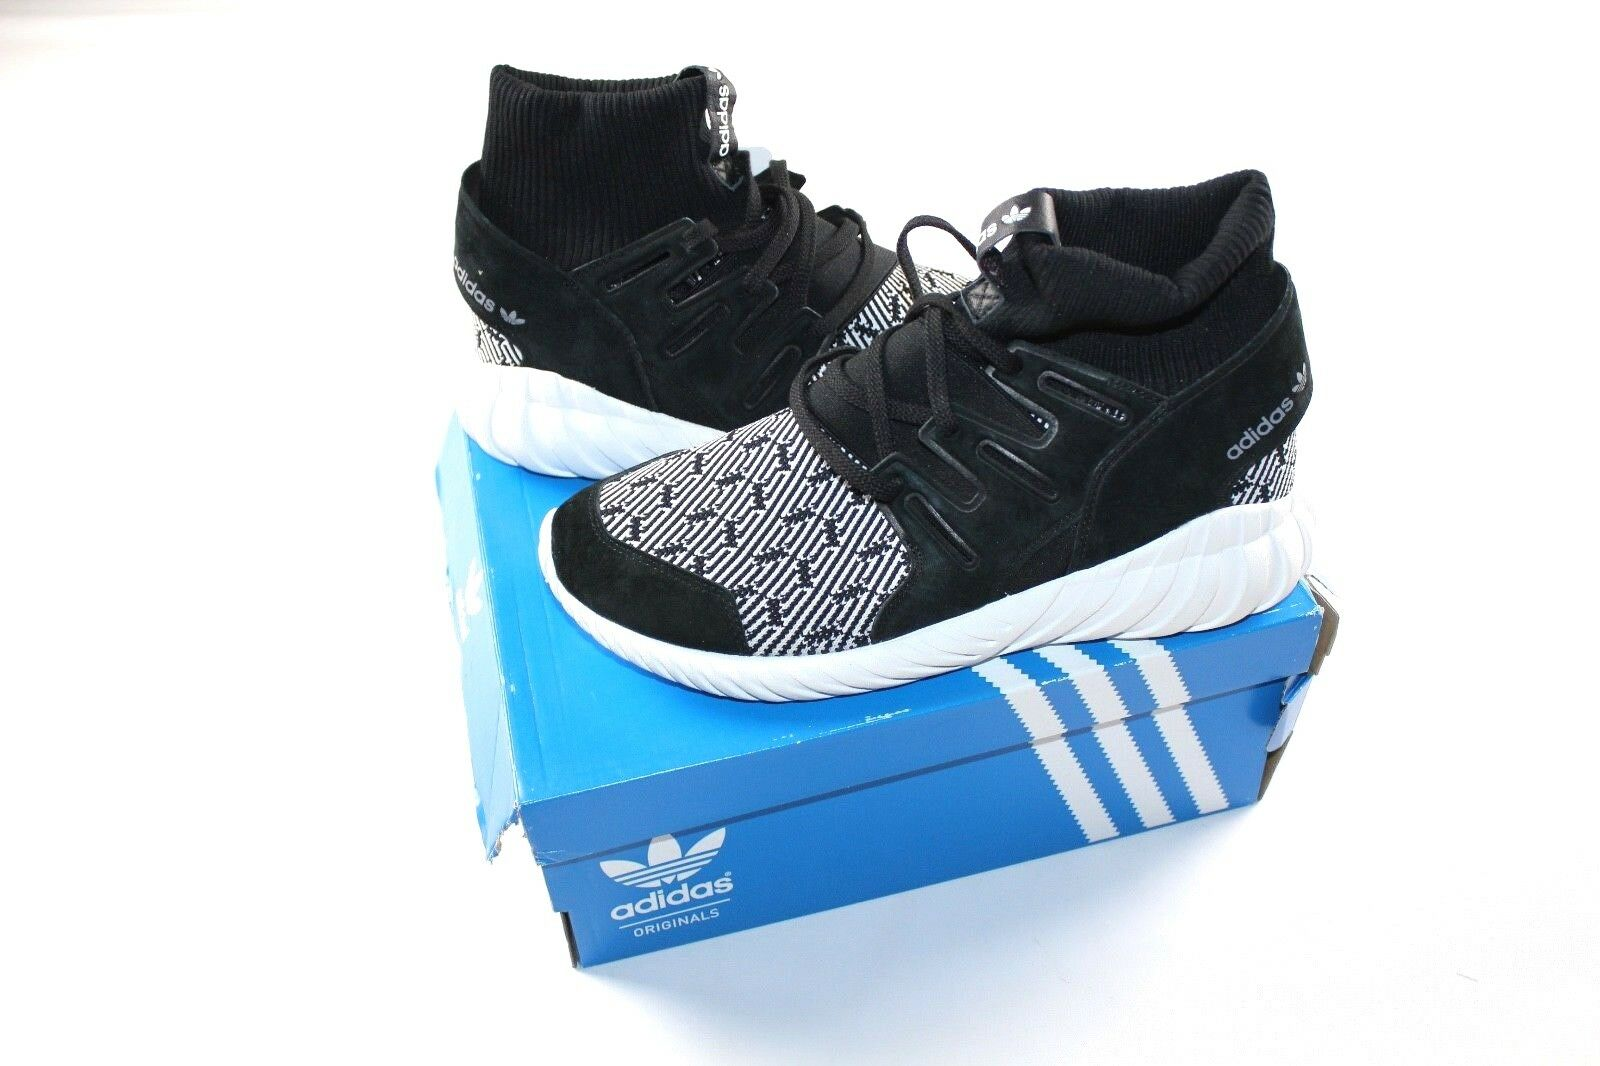 Nuove adidas tubulare Uomo 9,5 tubulare adidas doom primeknit casual scarpe scarpe bianco nero 331ede